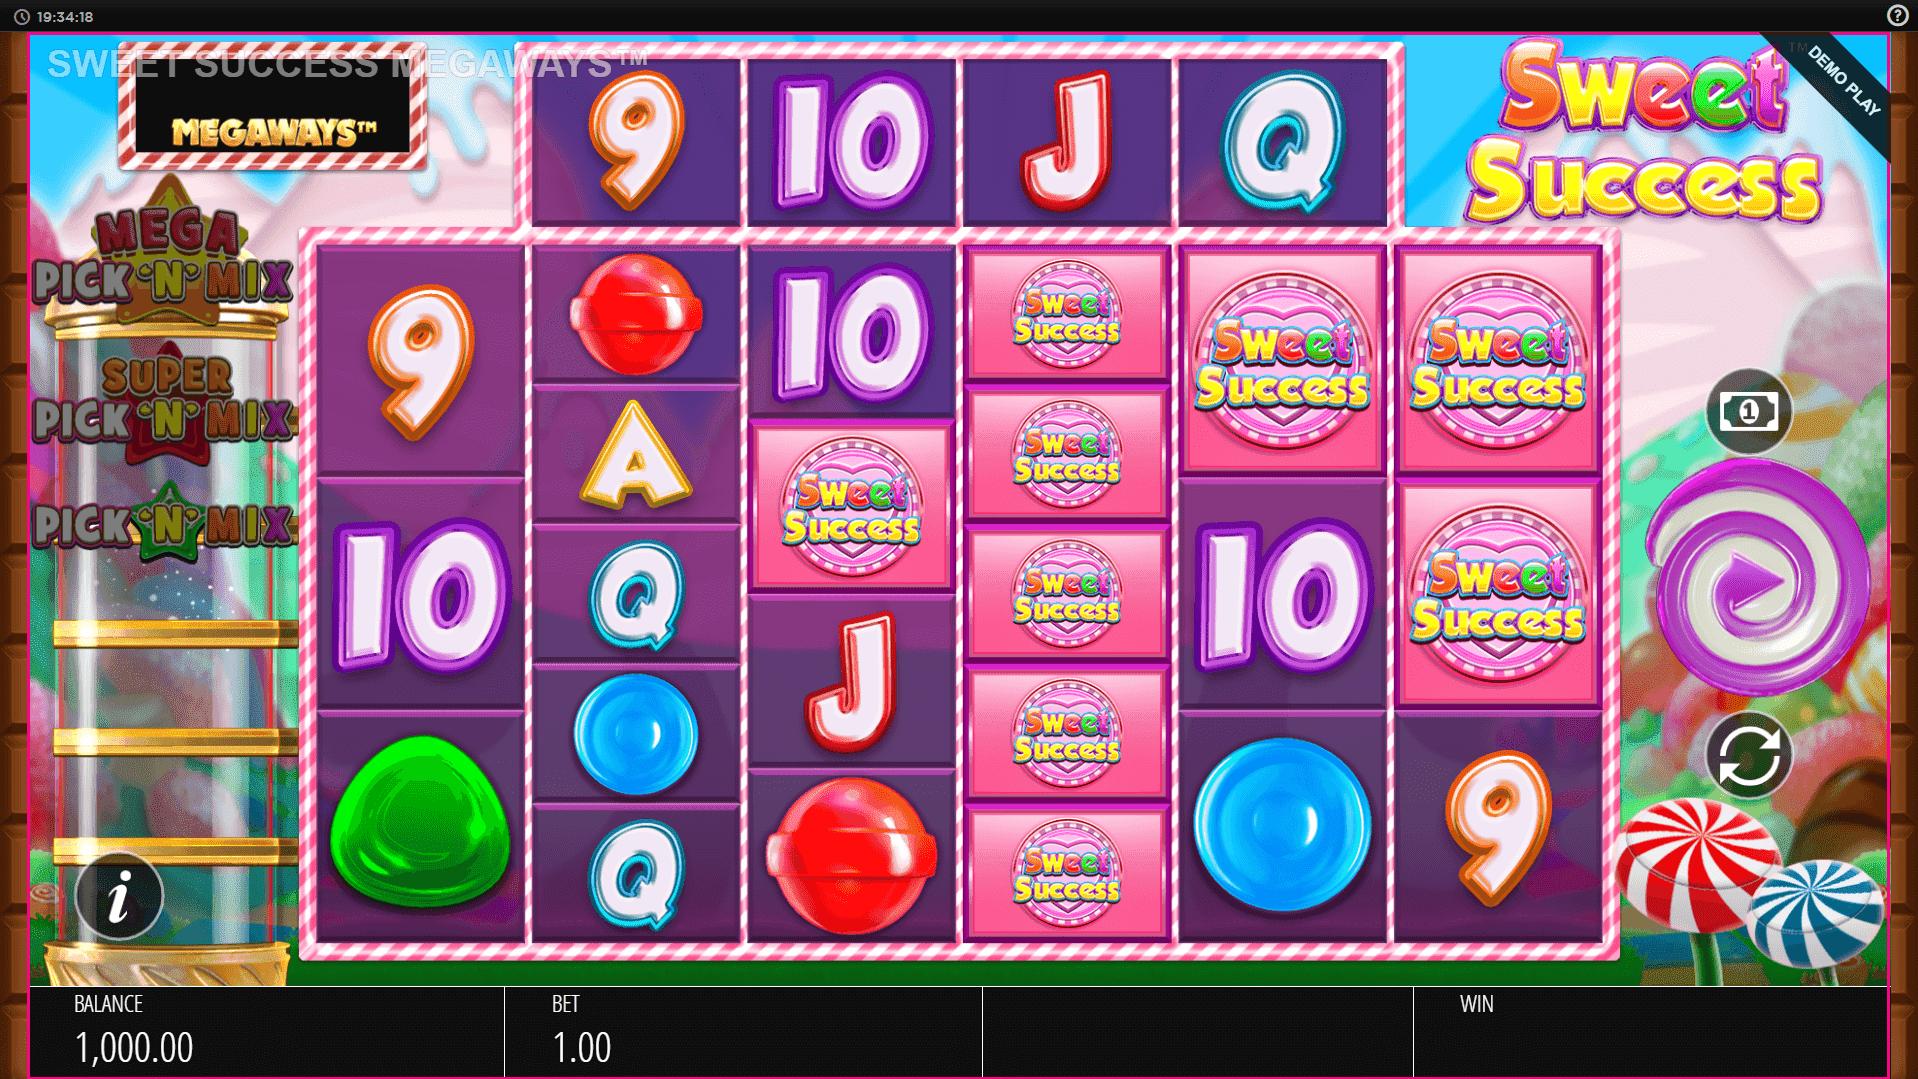 Sweet Success Megaways slot machine screenshot